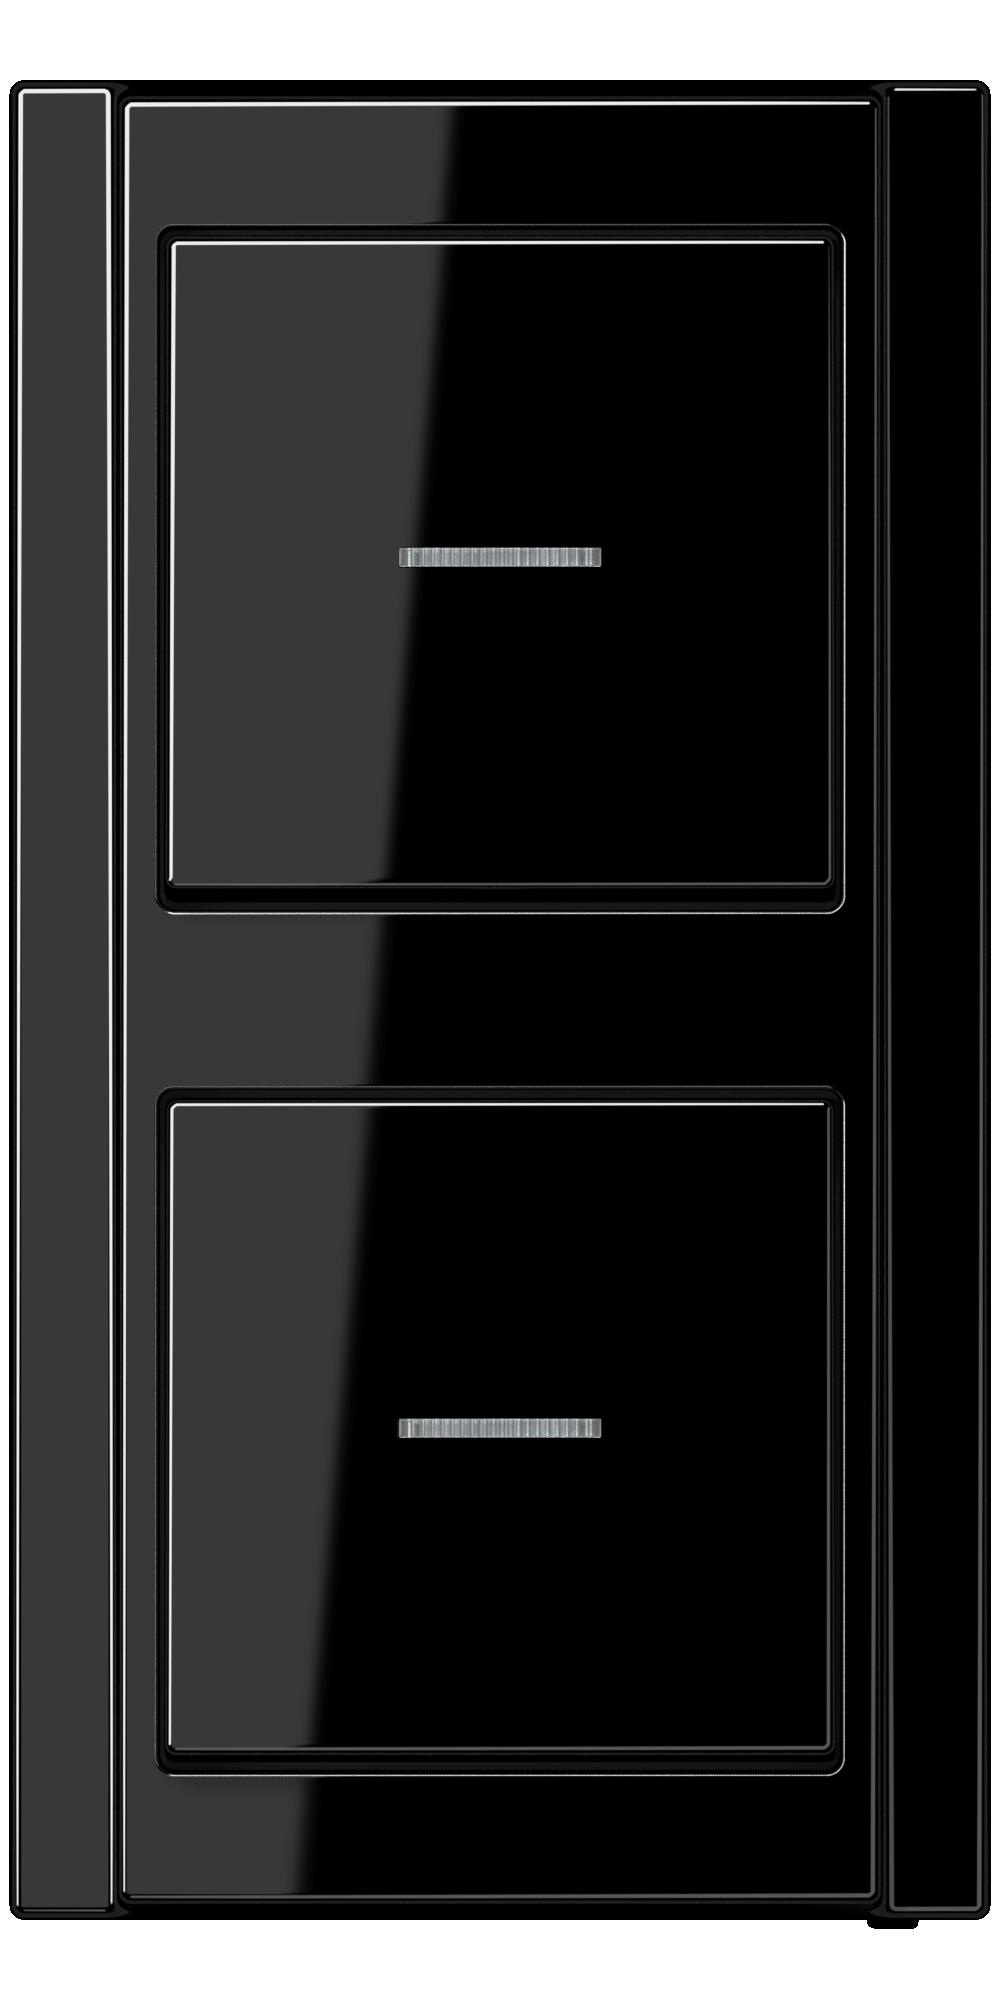 JUNG_A500_black_switch-lense_switch-lense